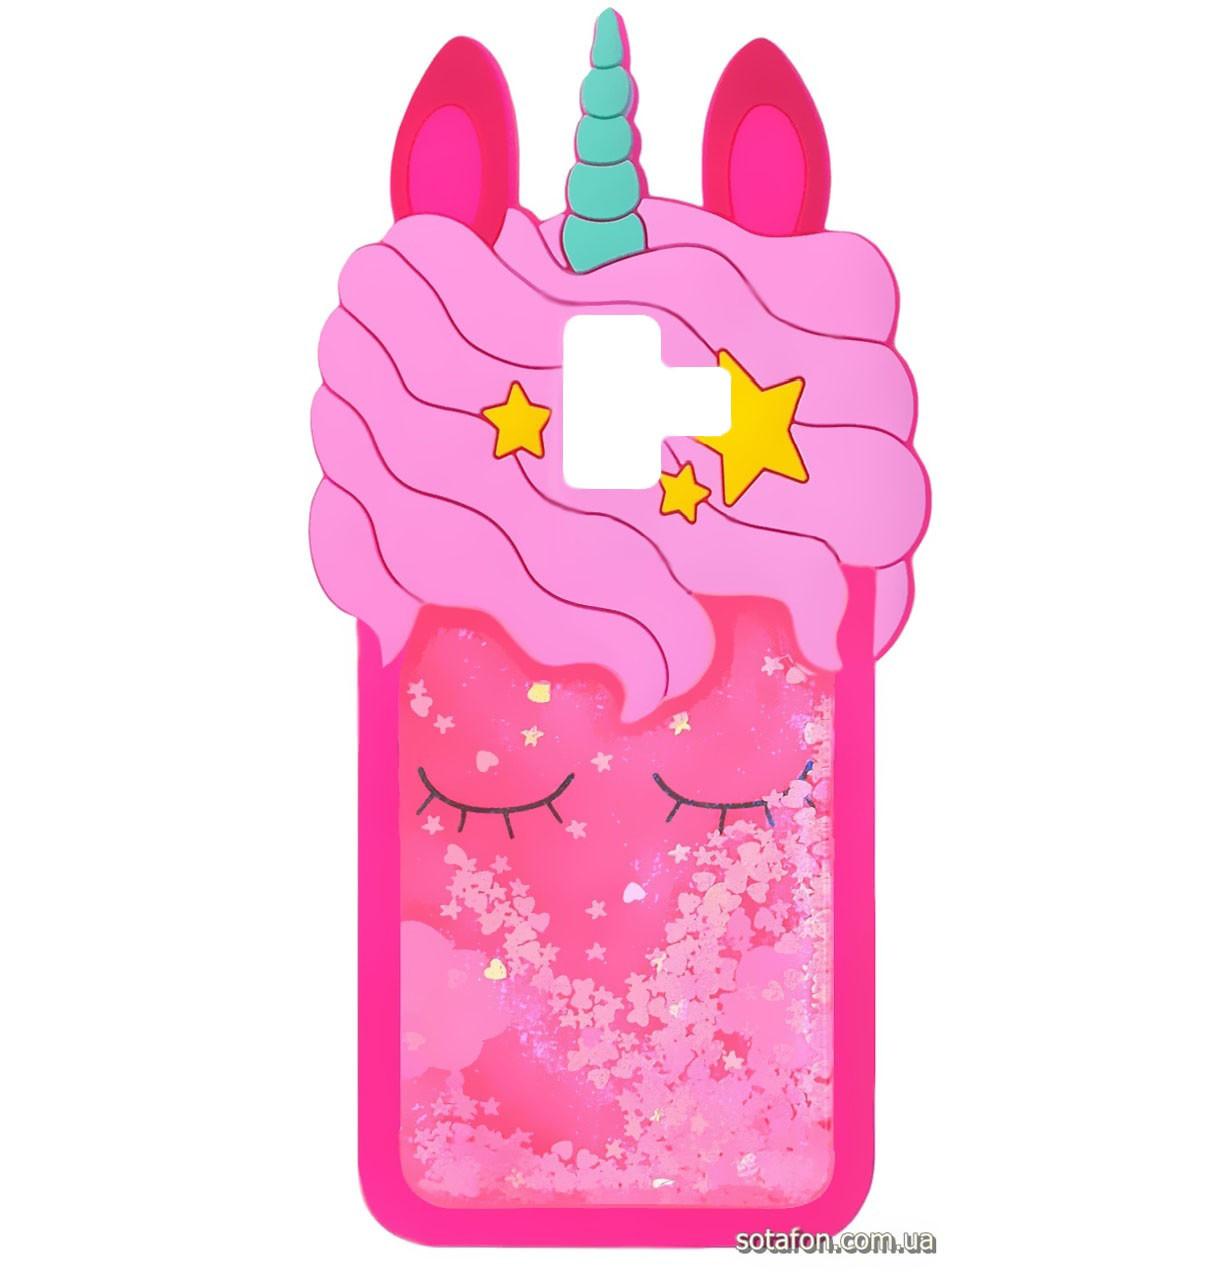 Чехол-накладка TPU 3D (Жидкий Блеск) Little Unicorn для Samsung Galaxy J6 Plus (2018) SM-J610F Crimson